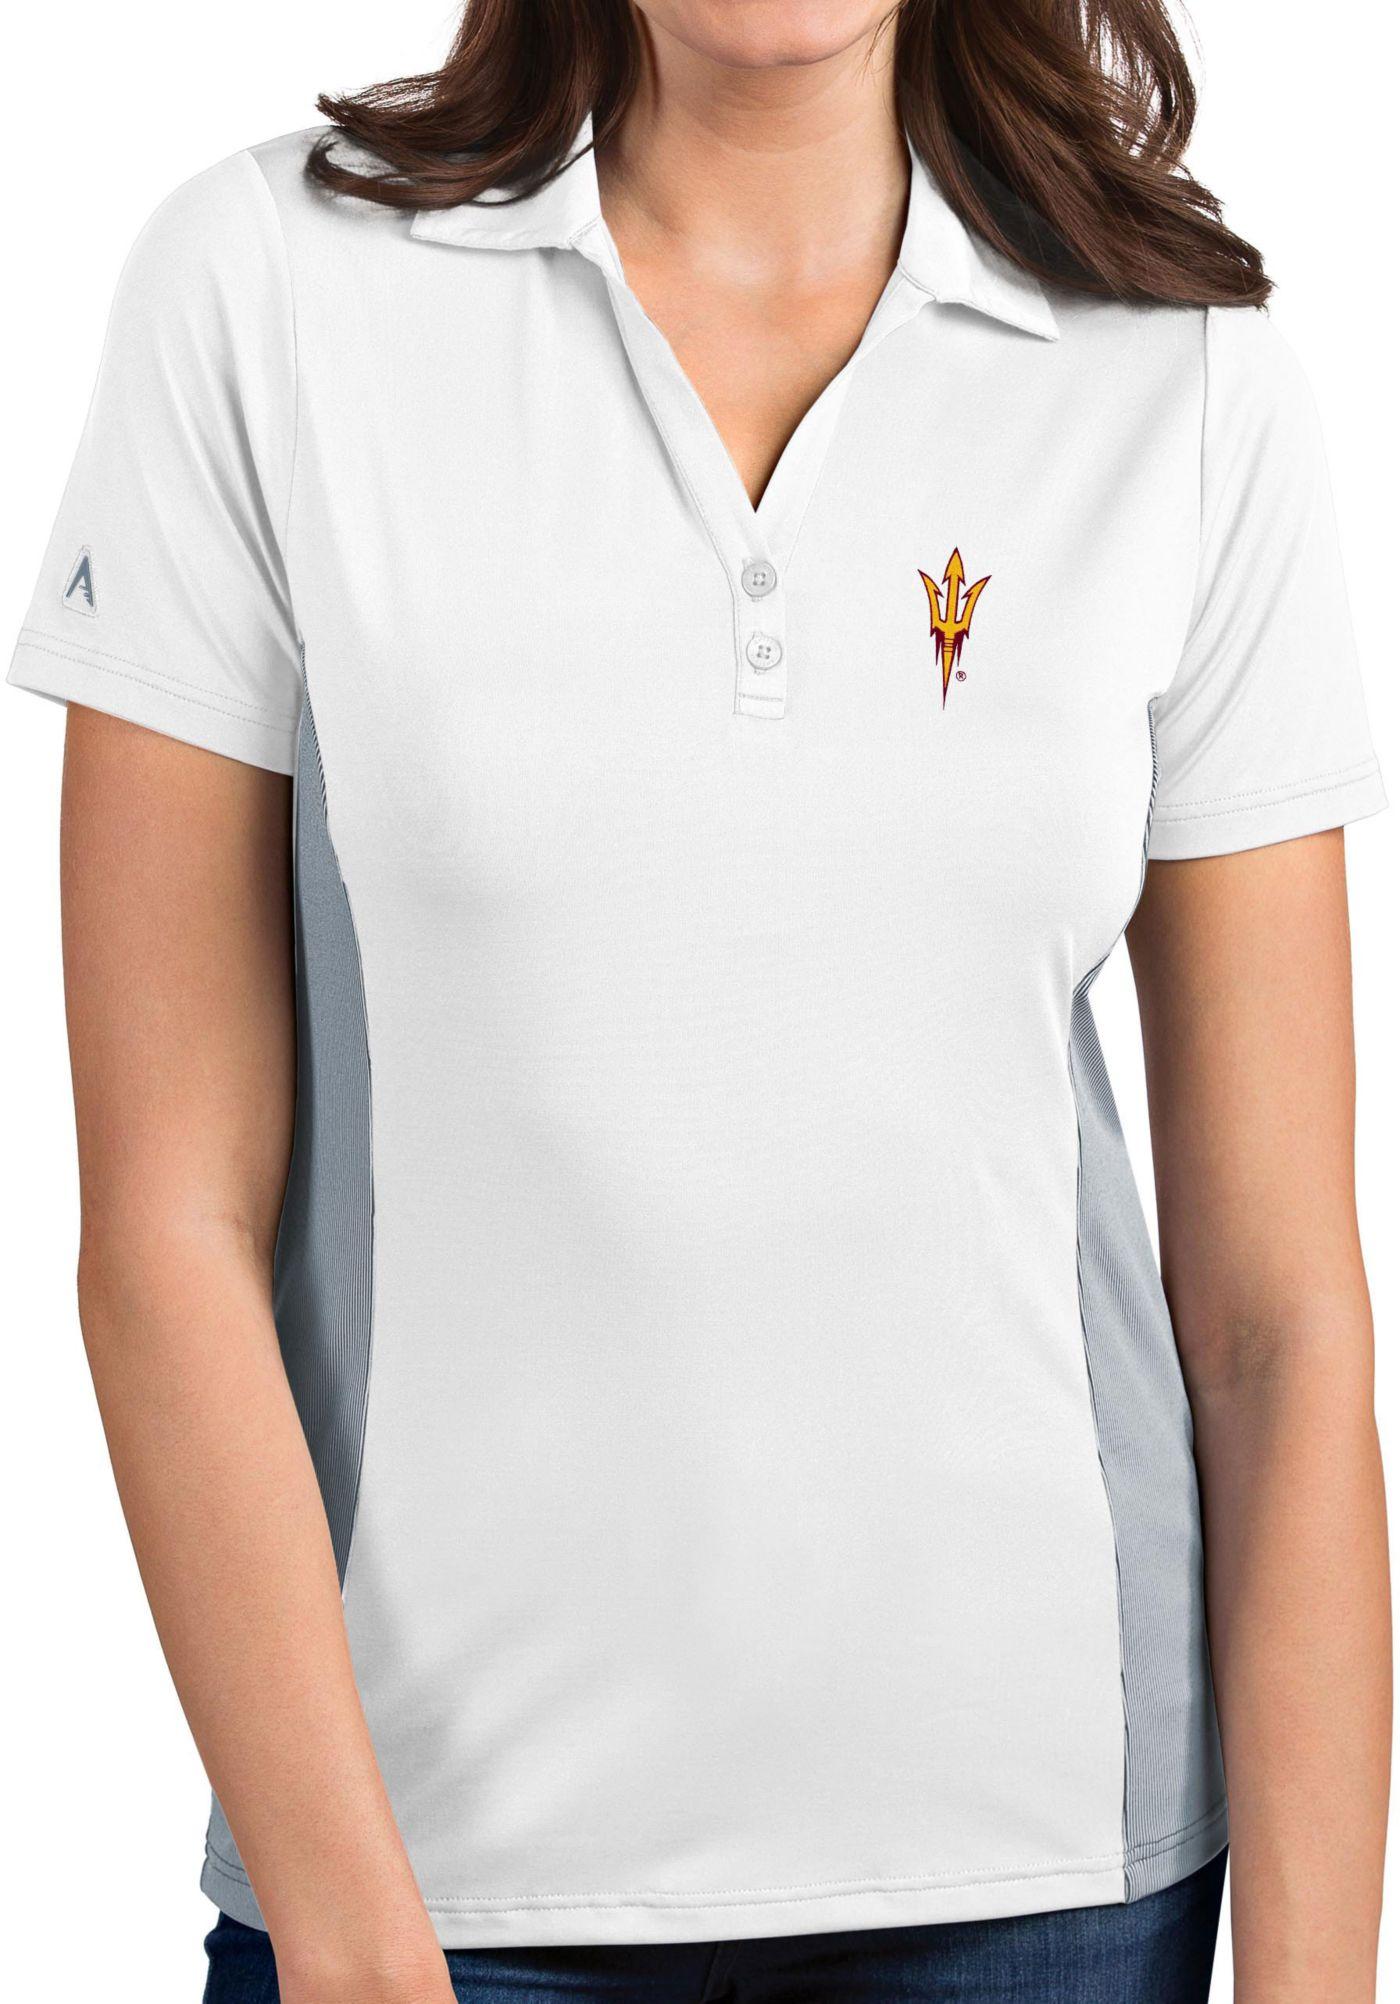 Antigua Women's Arizona State Sun Devils Venture White Polo